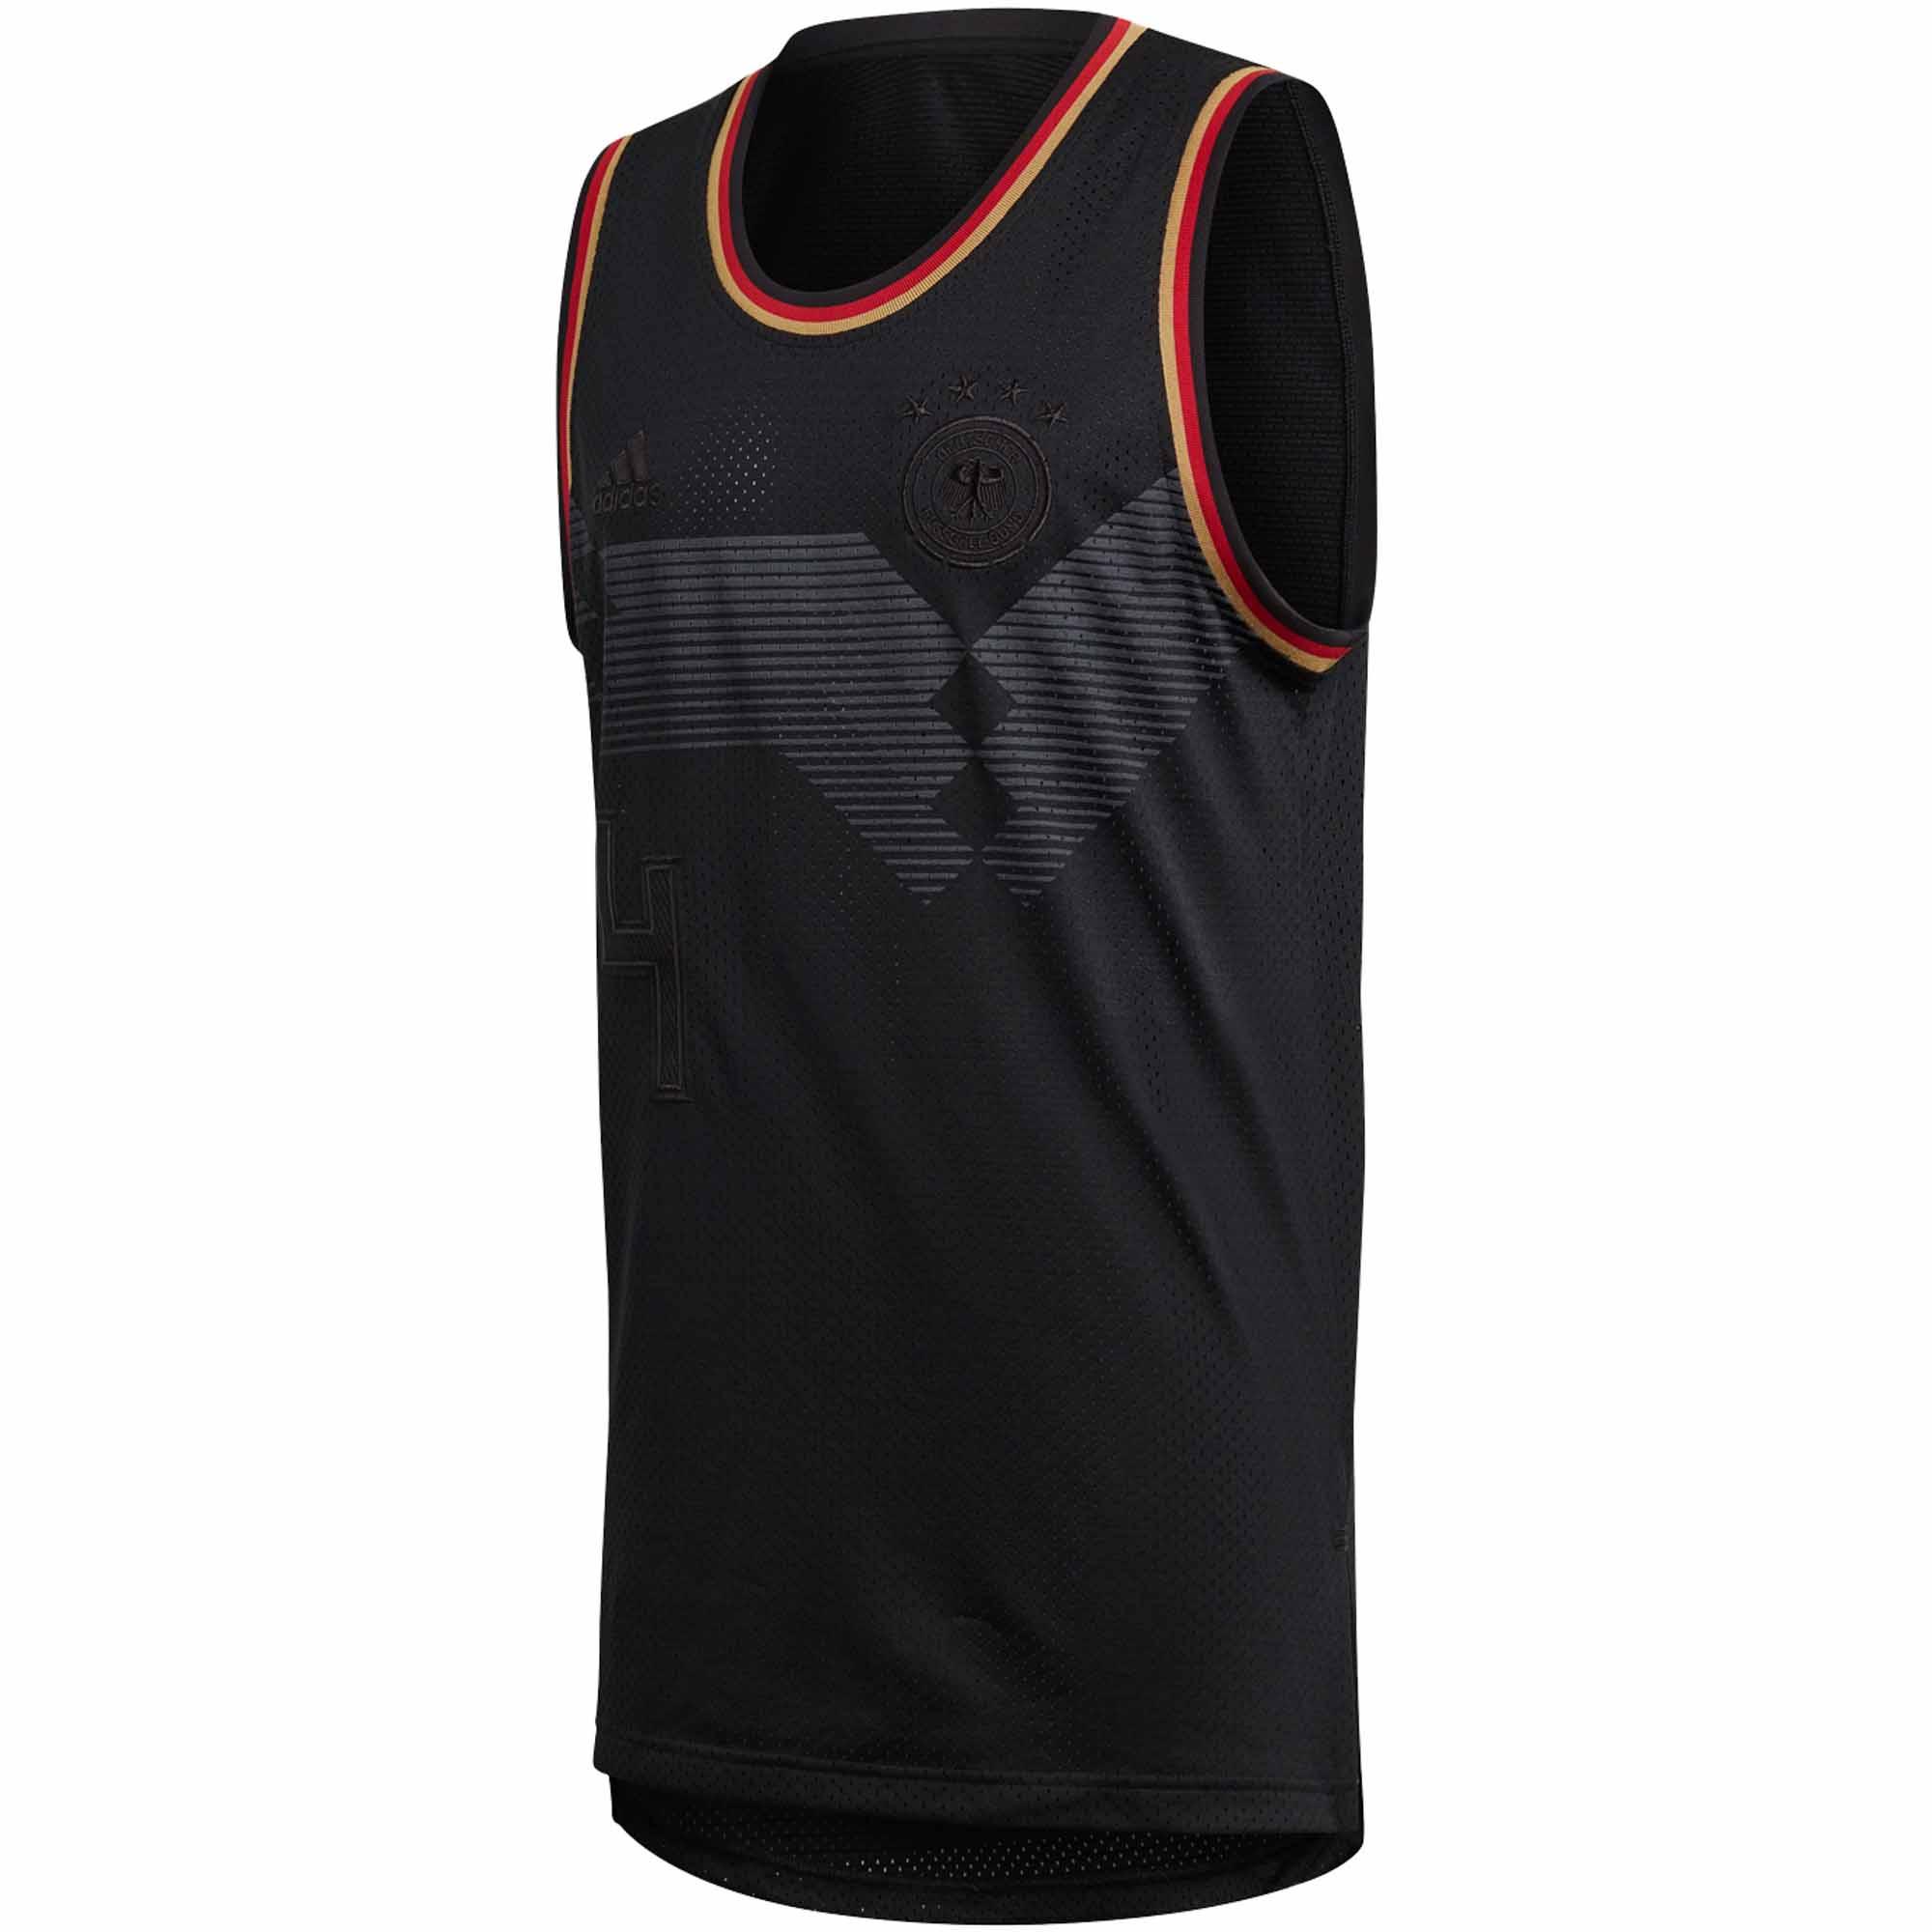 00acbf45cbf5ae adidas Germany Basketball Jersey 2018-19 - SoccerPro